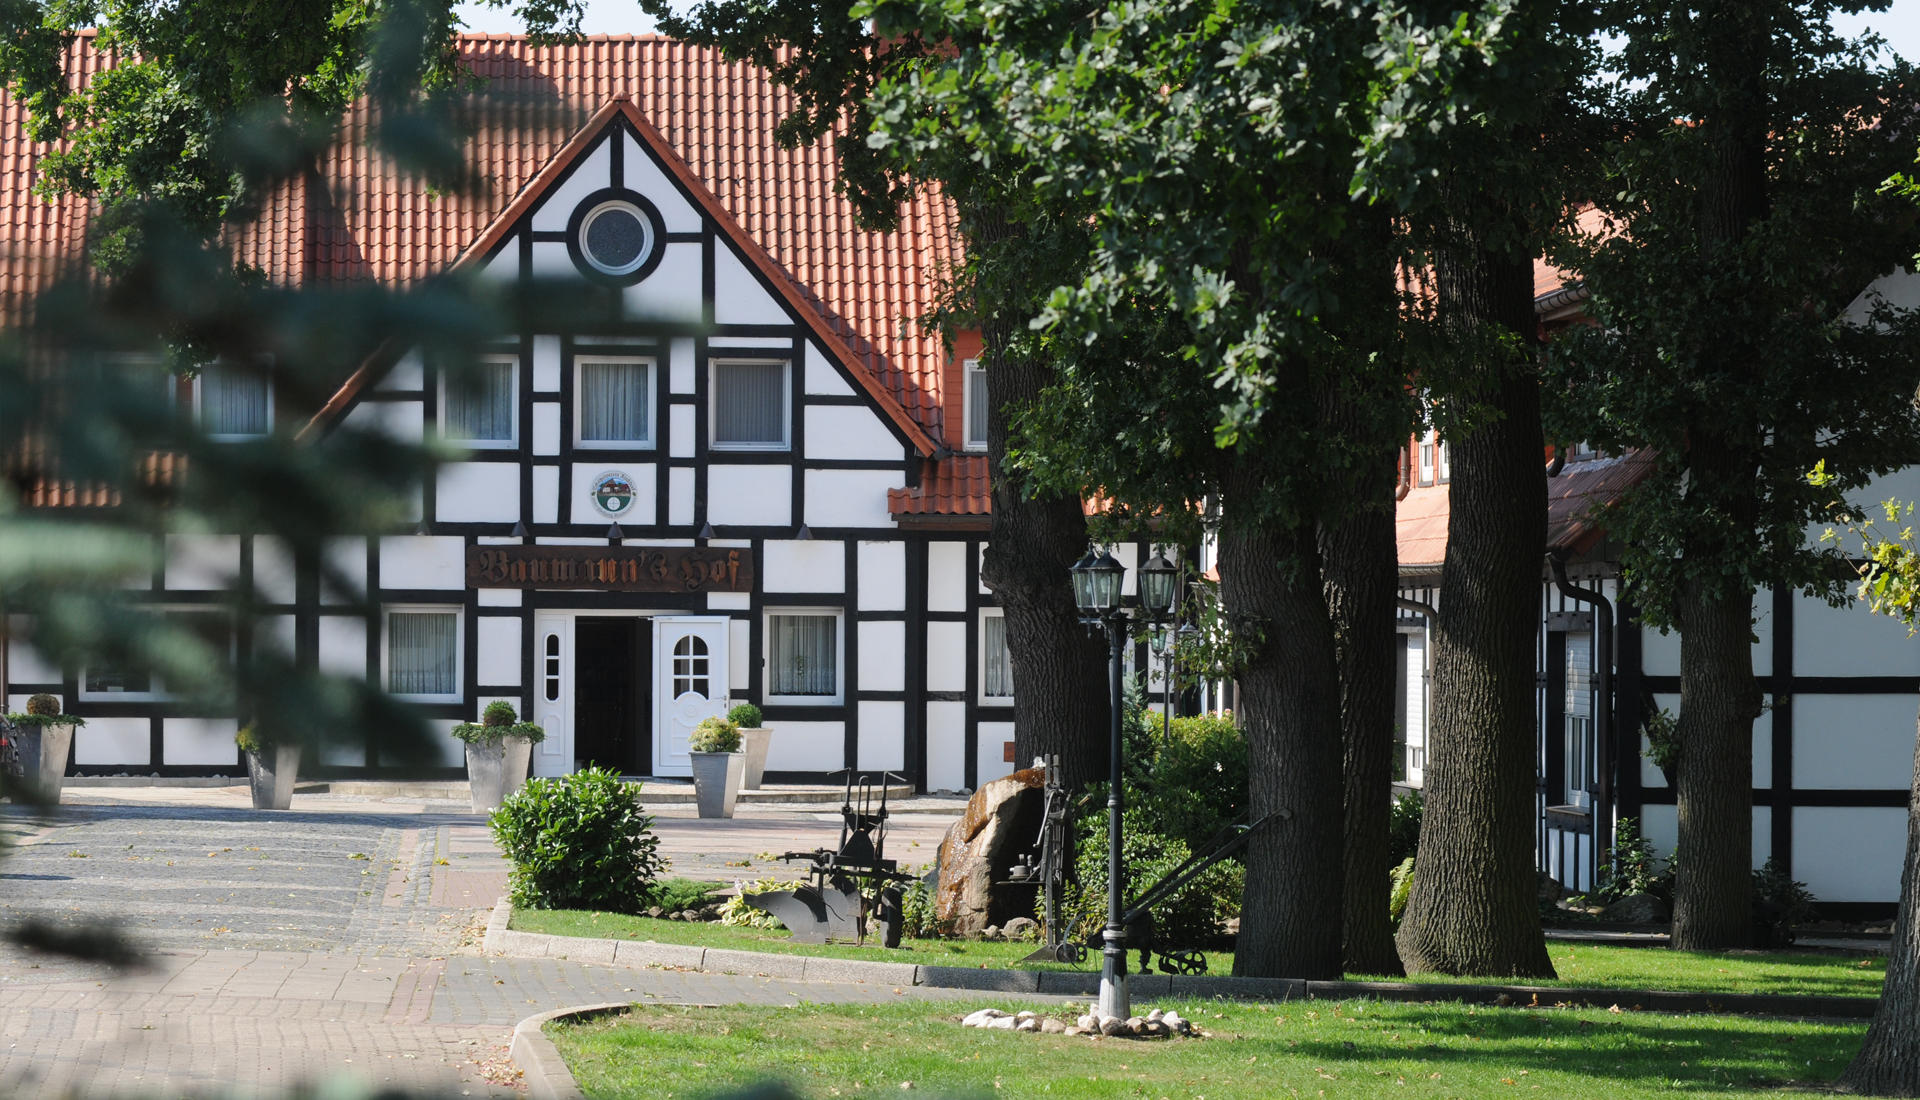 Landhotel Baumanns Hof